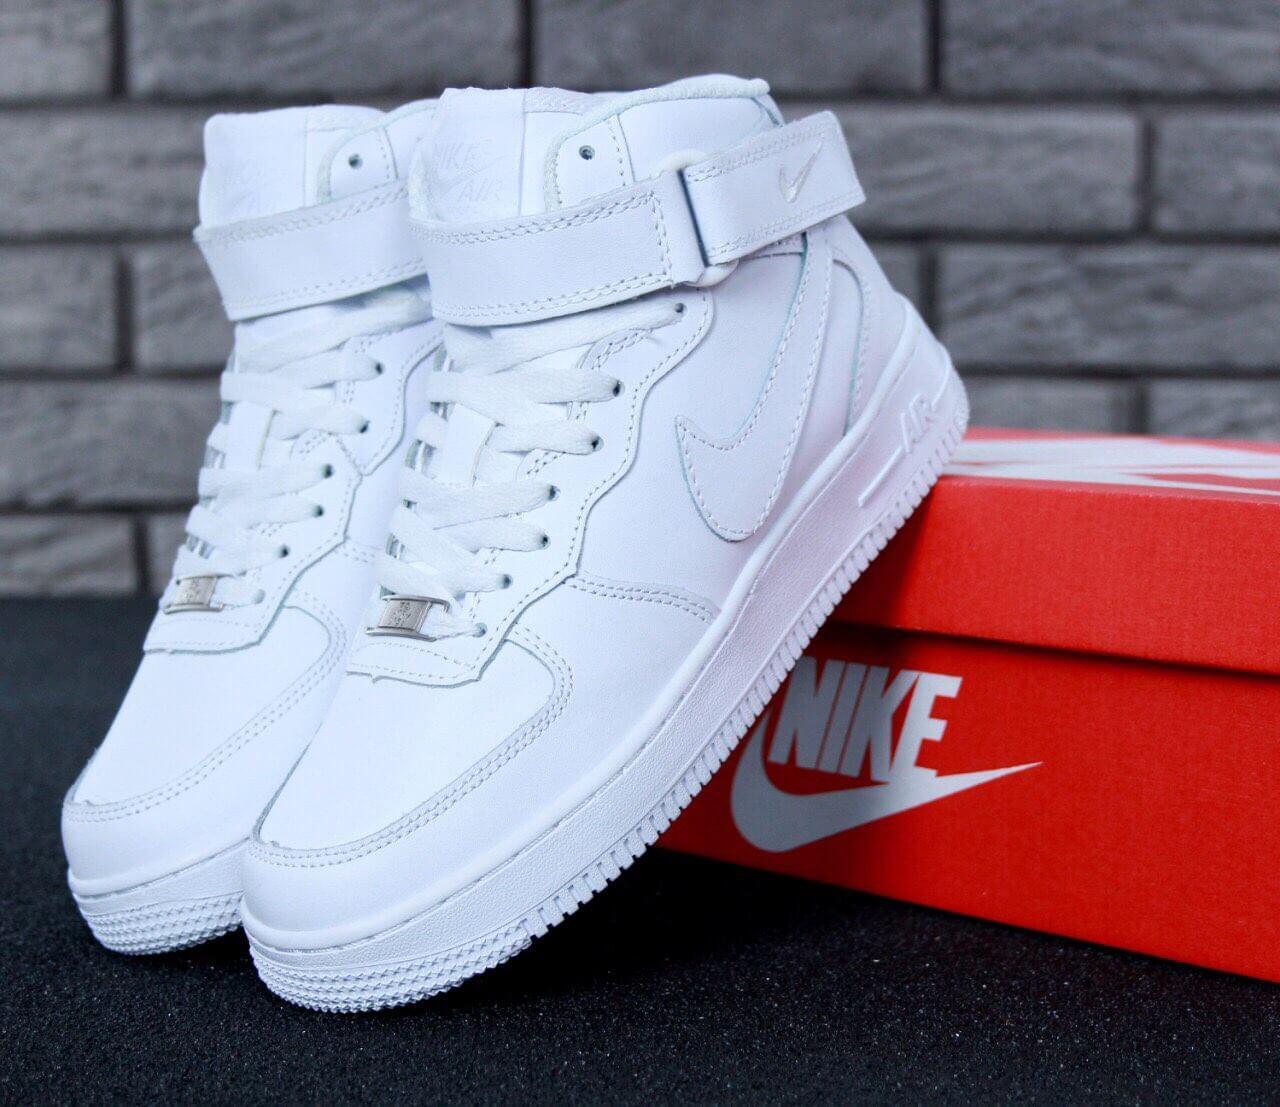 4c5ce4e358d4 Кроссовки с мехом Nike Air Force 1 High White Winter - Интернет магазин  обуви «im